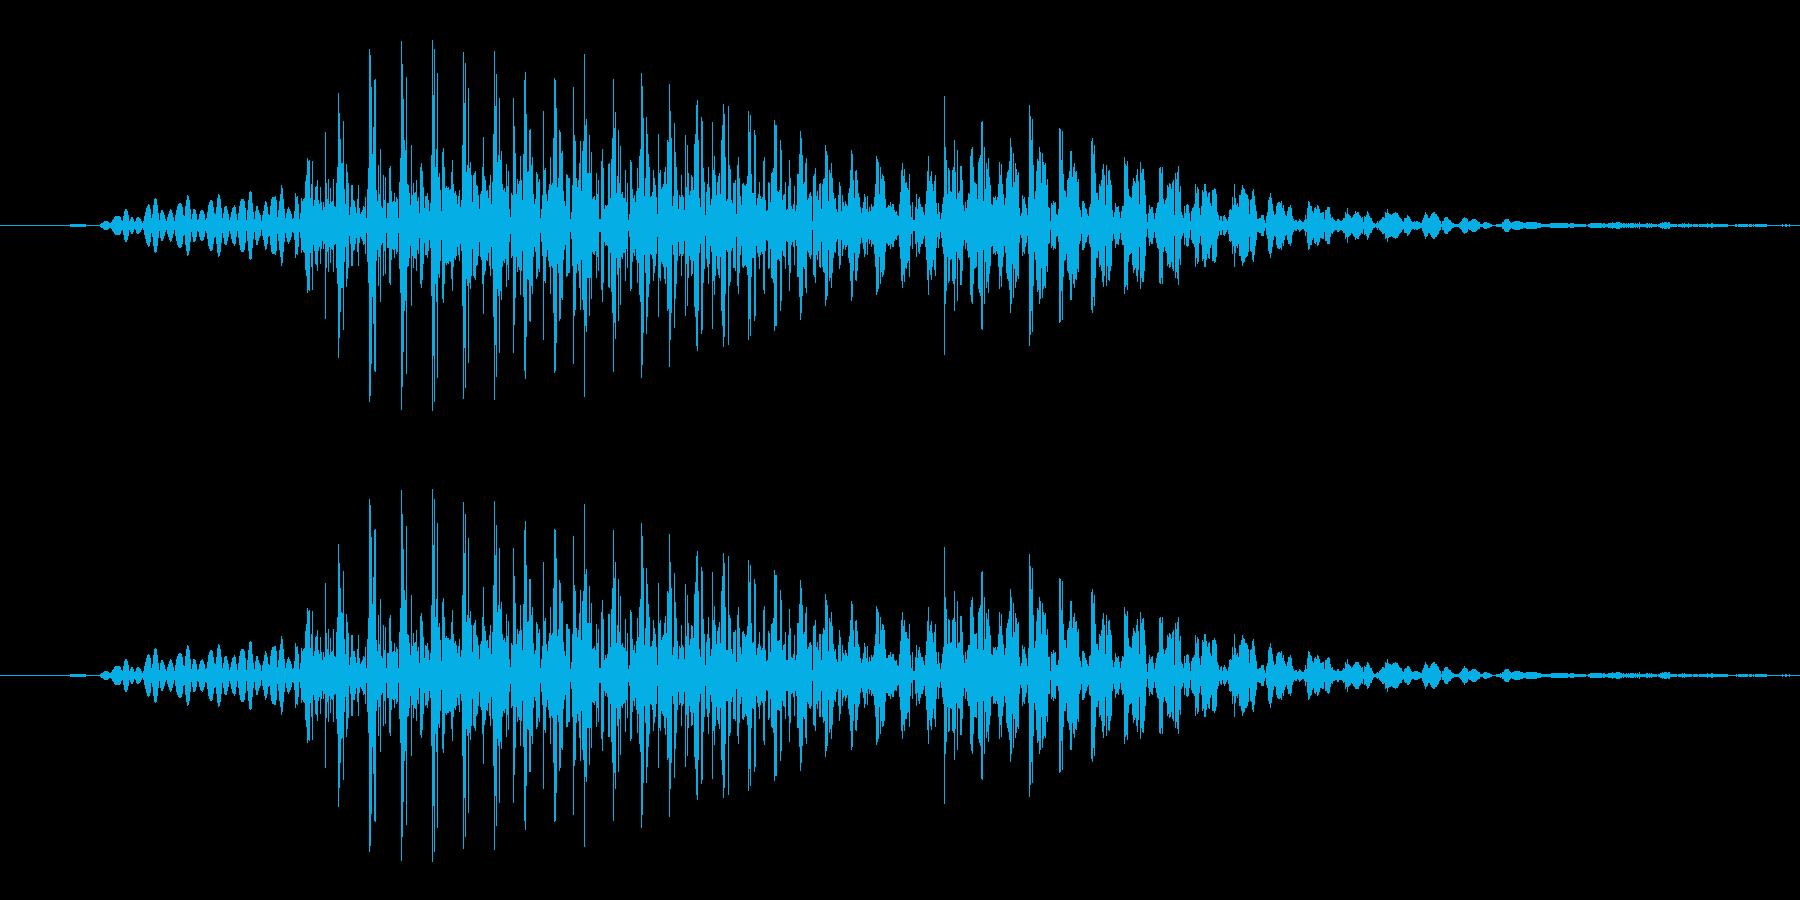 9 (nine, 英語、男国女性声優J…の再生済みの波形